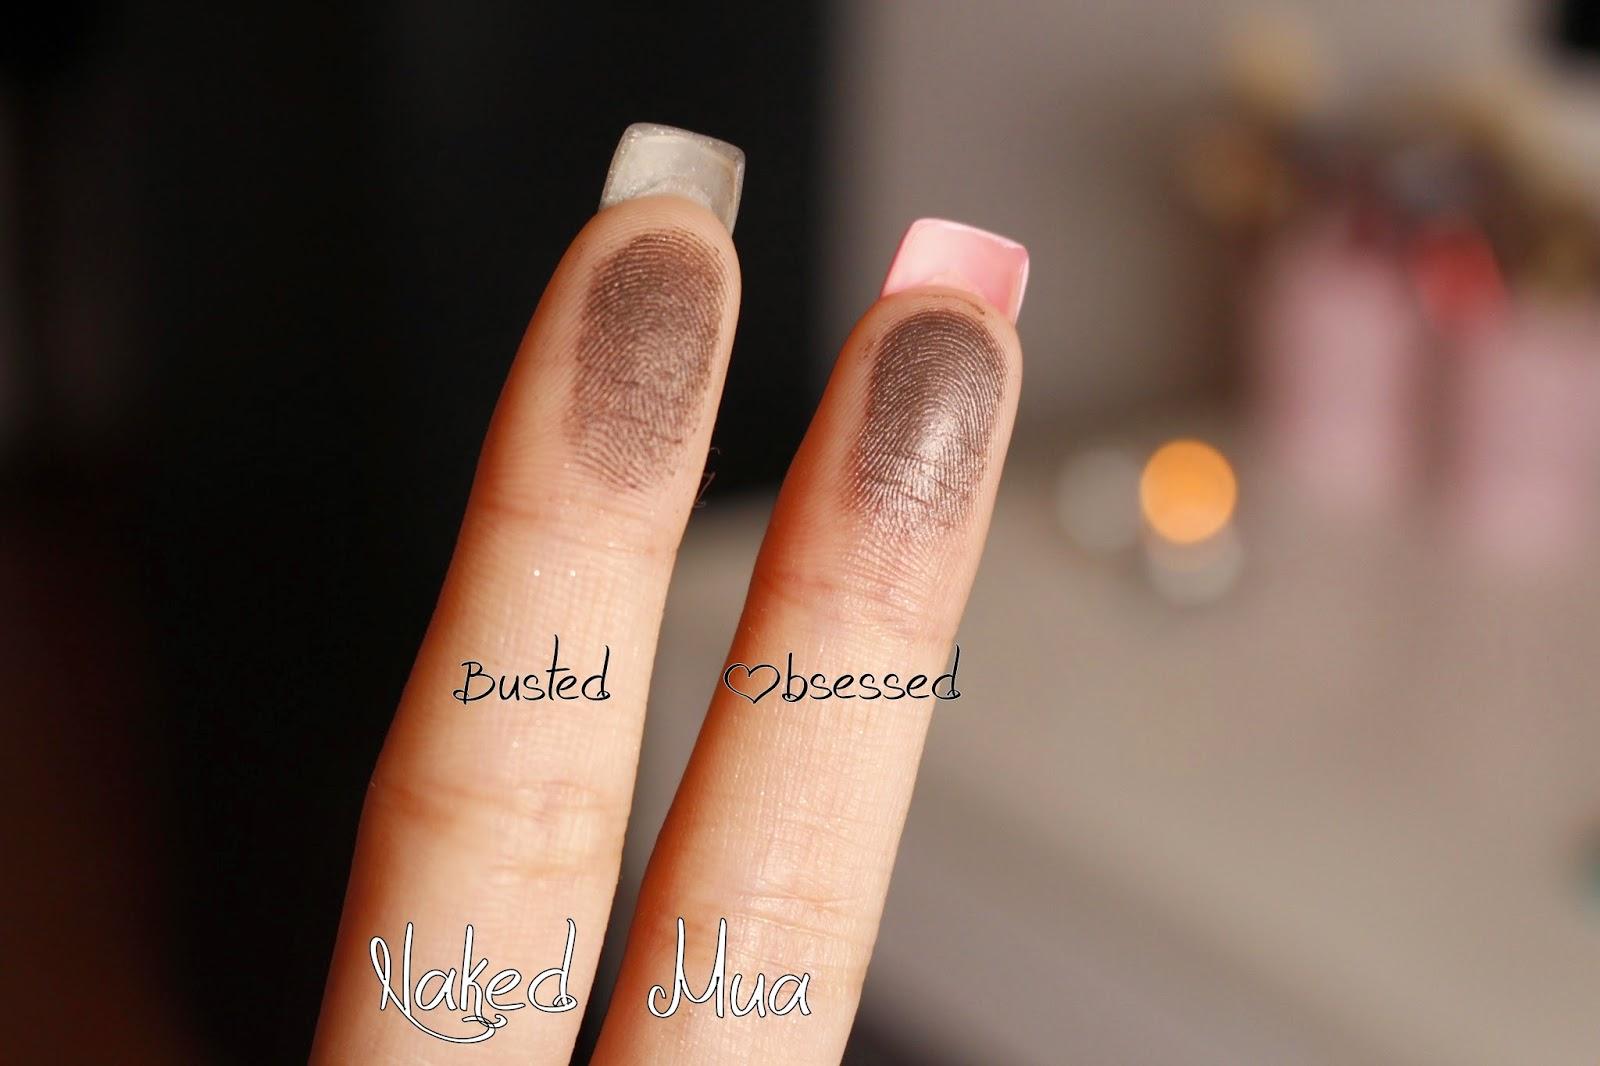 naked 2 da urban decay vs undress me too da mua